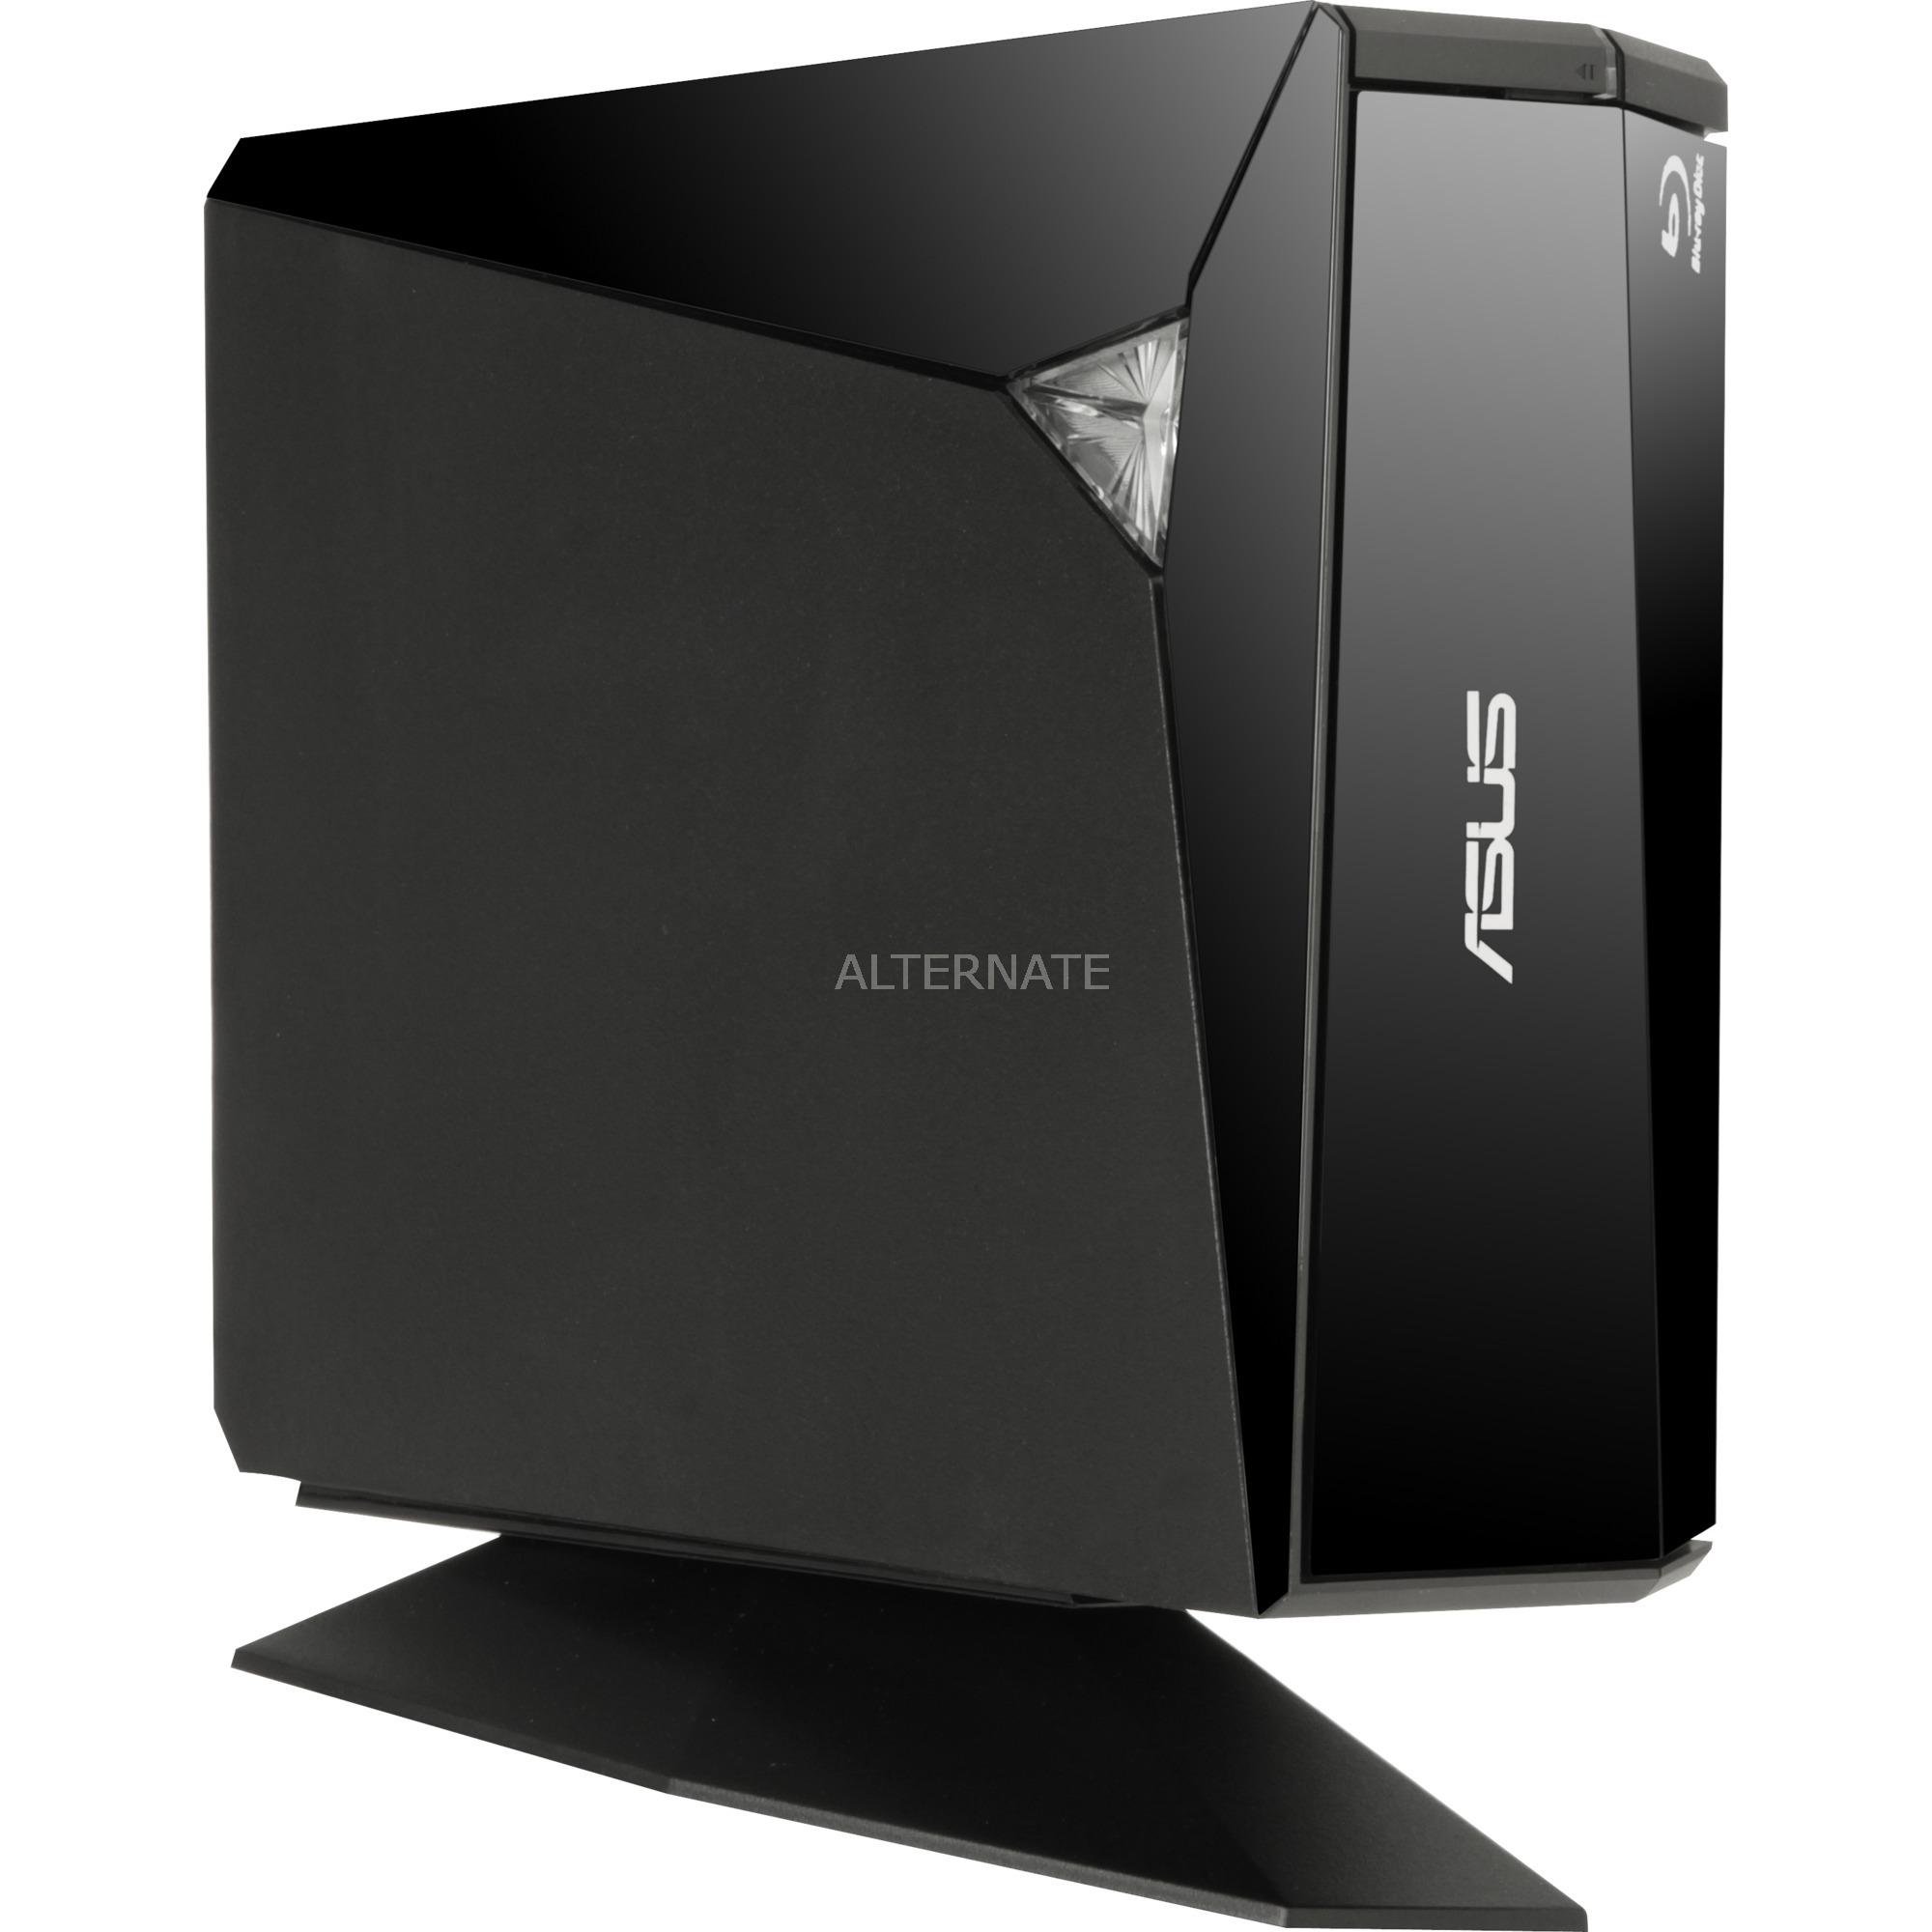 Asus+BW+12D1S-U+Masterizzatore+Blu-ray